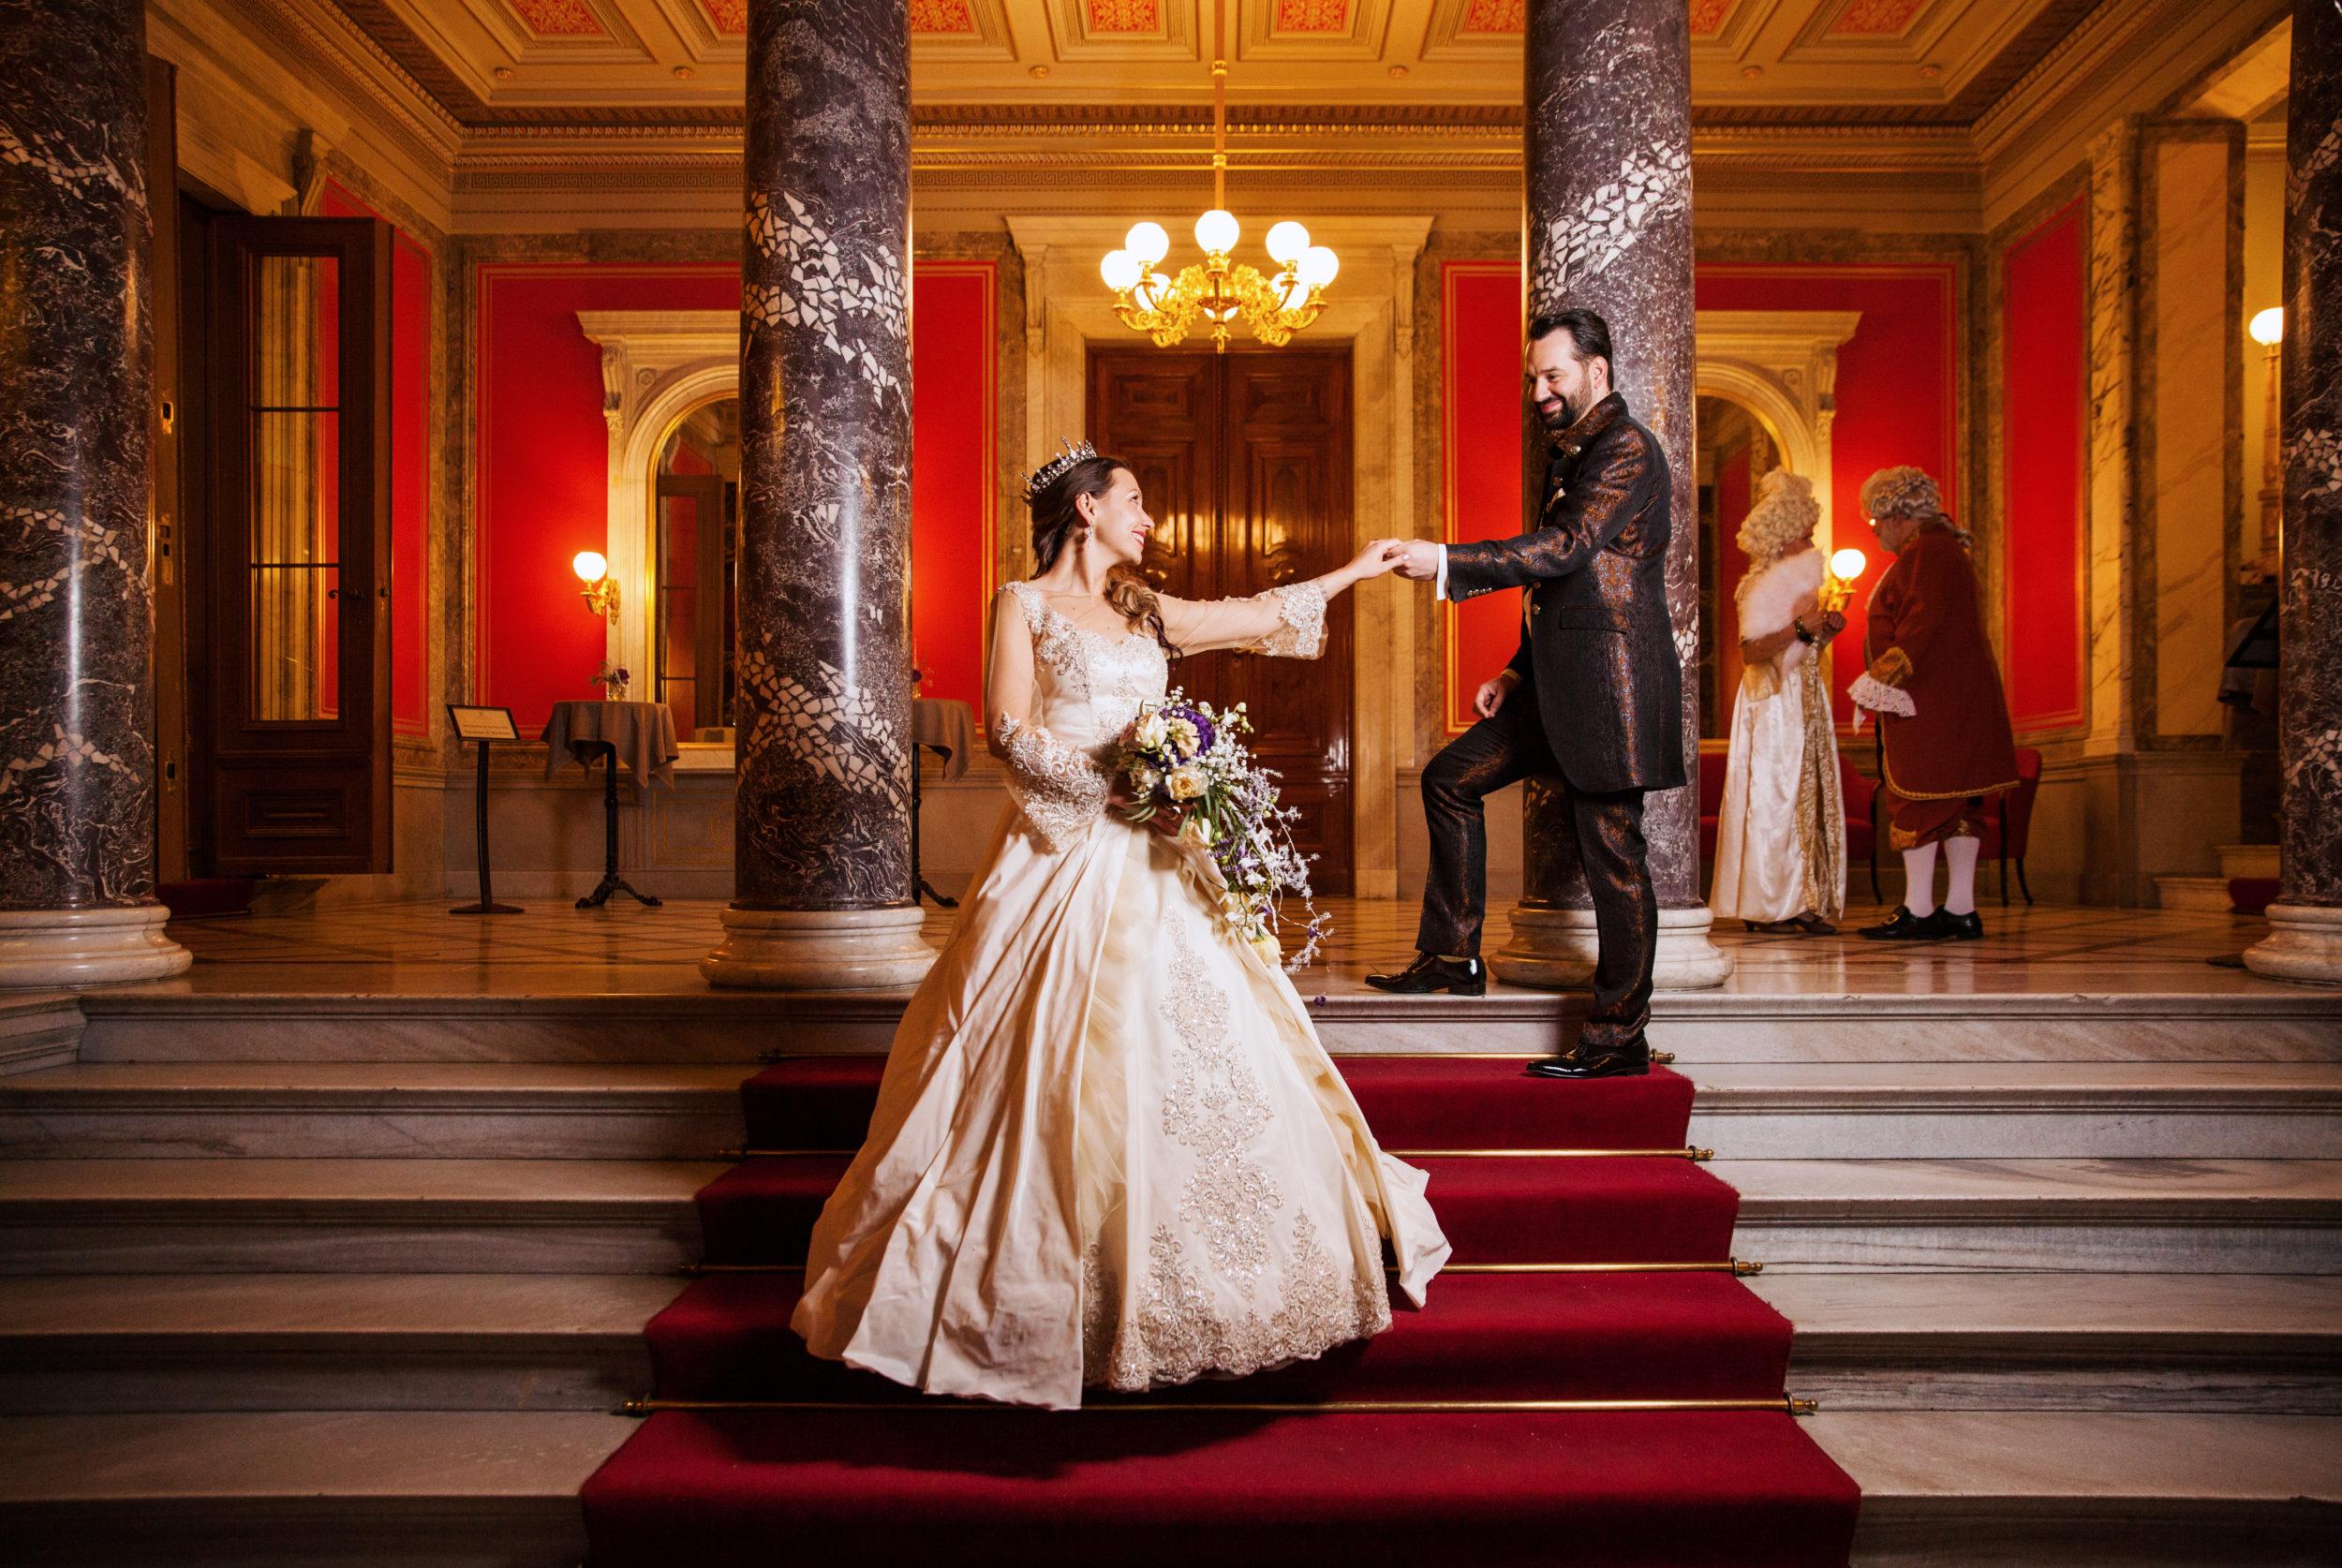 Myrelle Couture Marina Deynega Brautmode Hochzeit Anzug Massgeschneidert Royal Wedding Cm 09